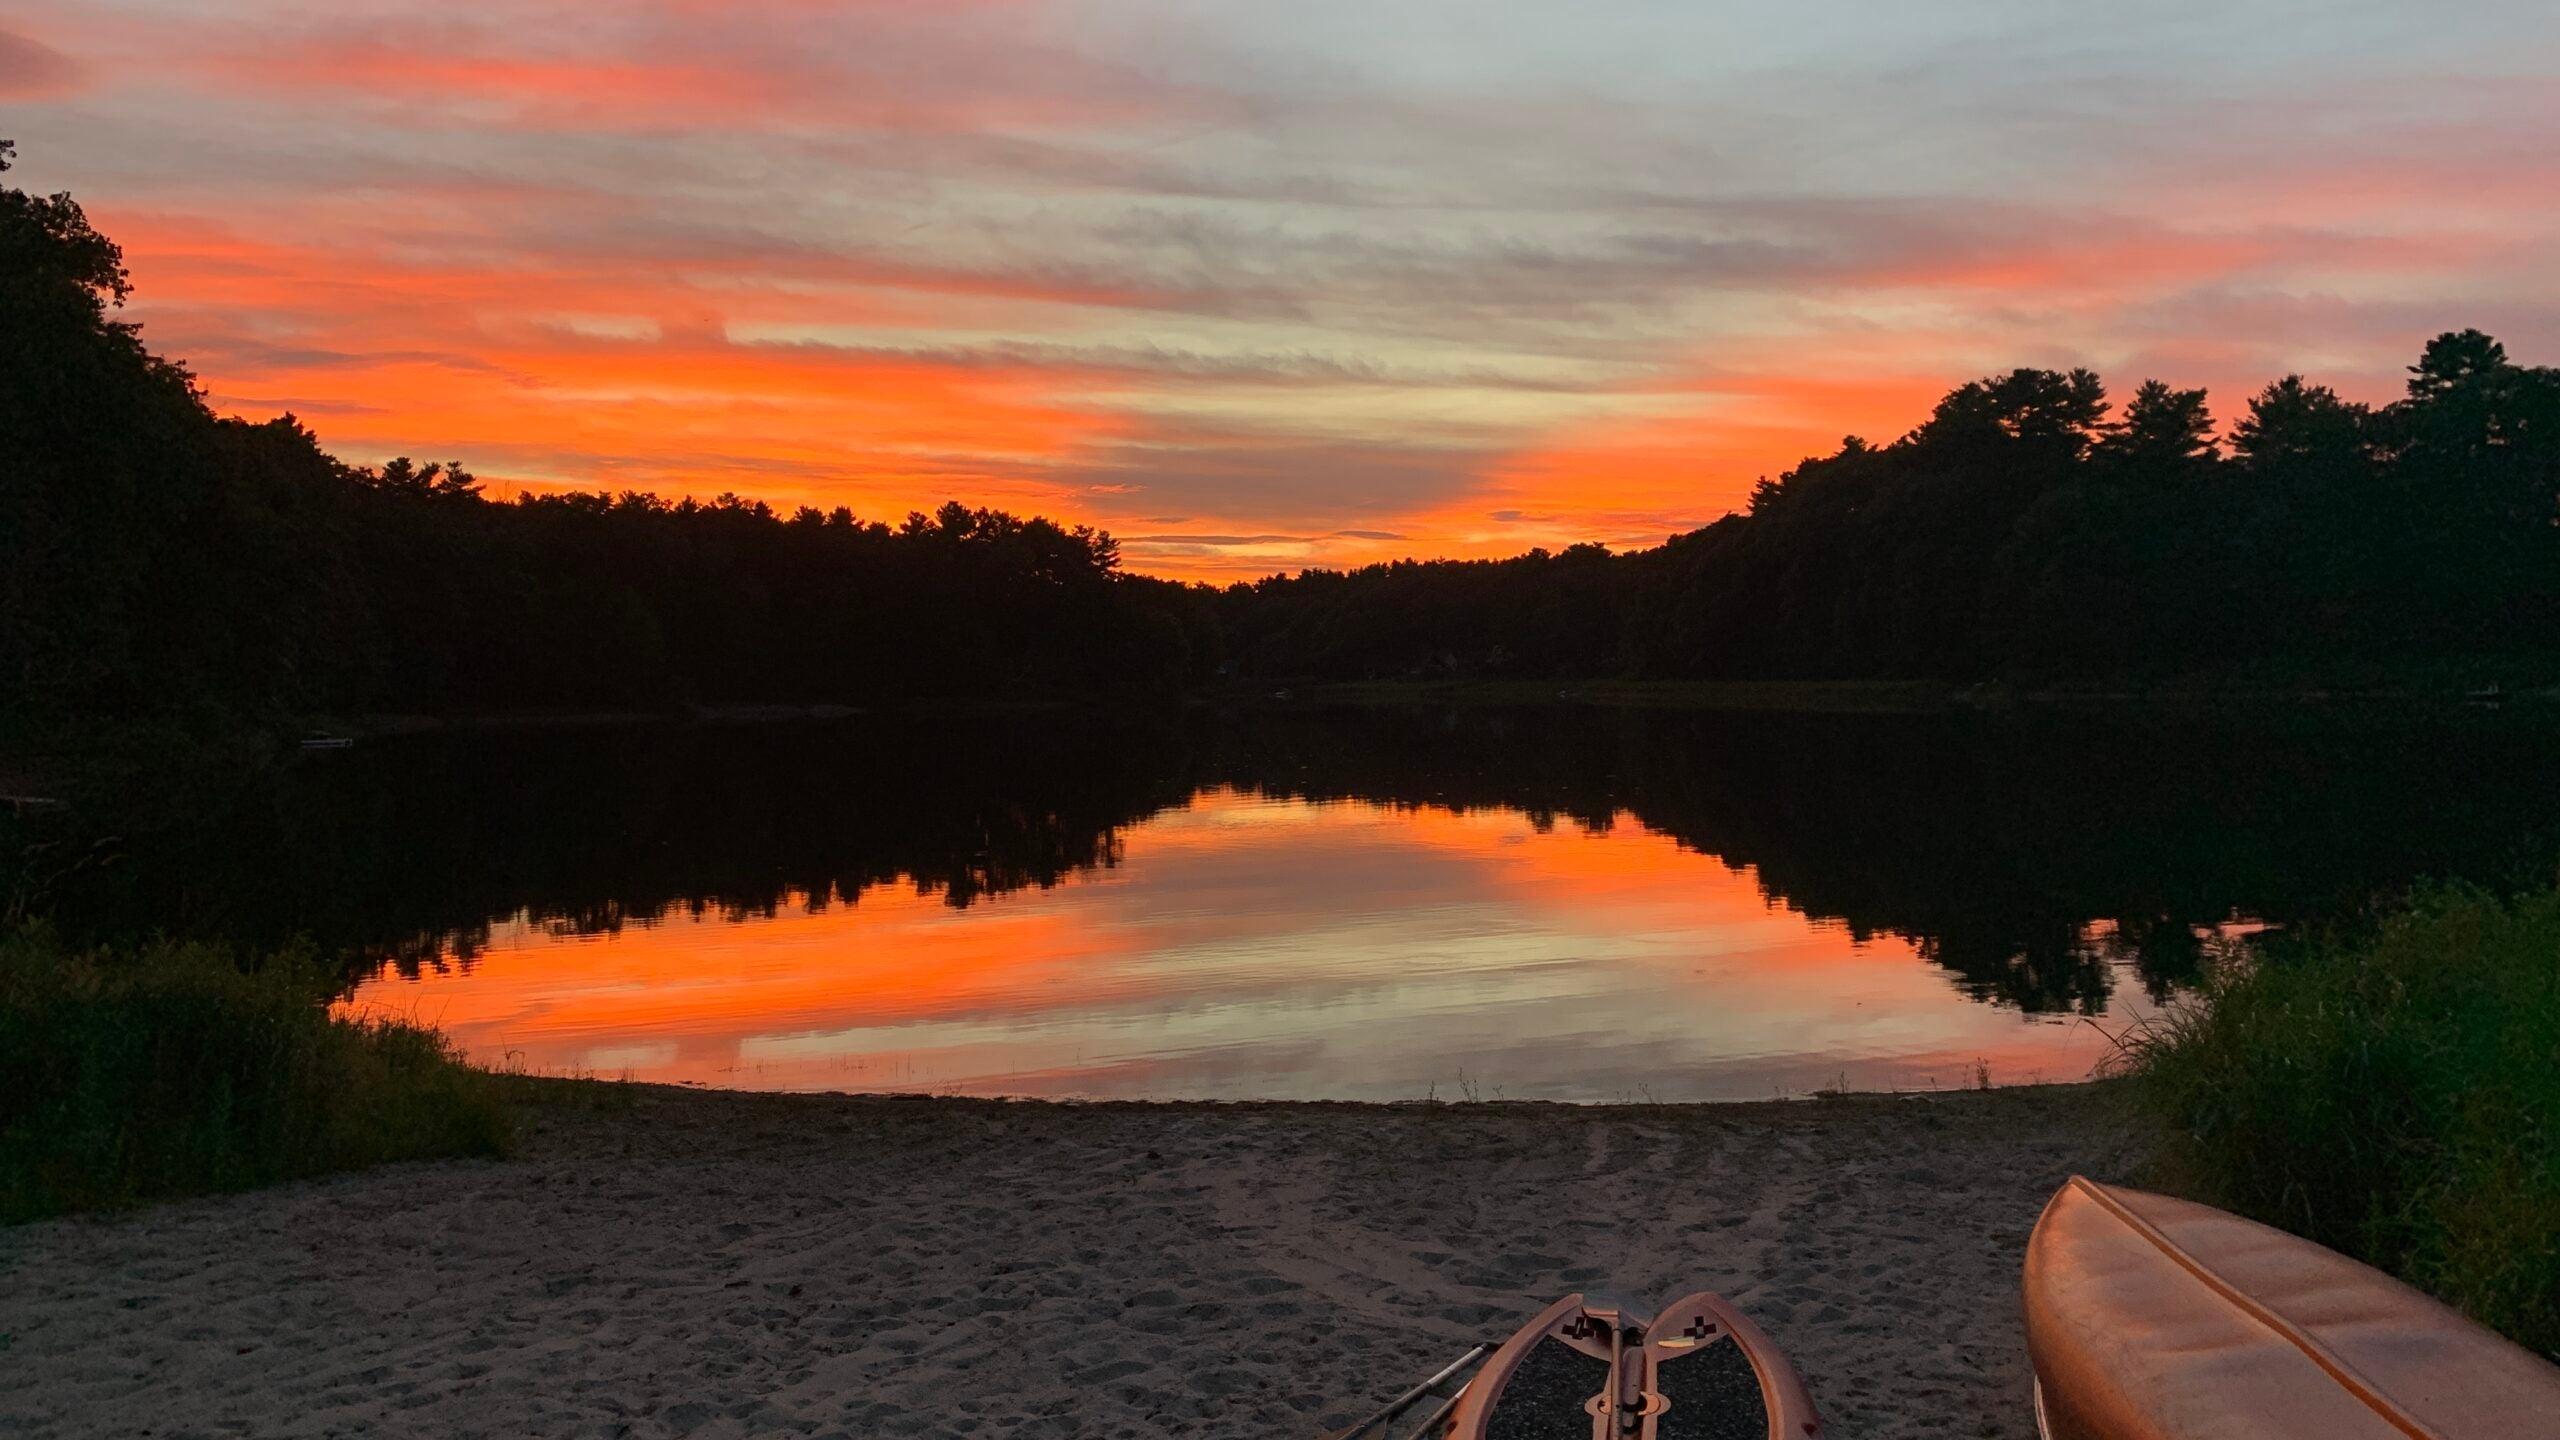 Sunset at Kingsbury Pond in Norfolk